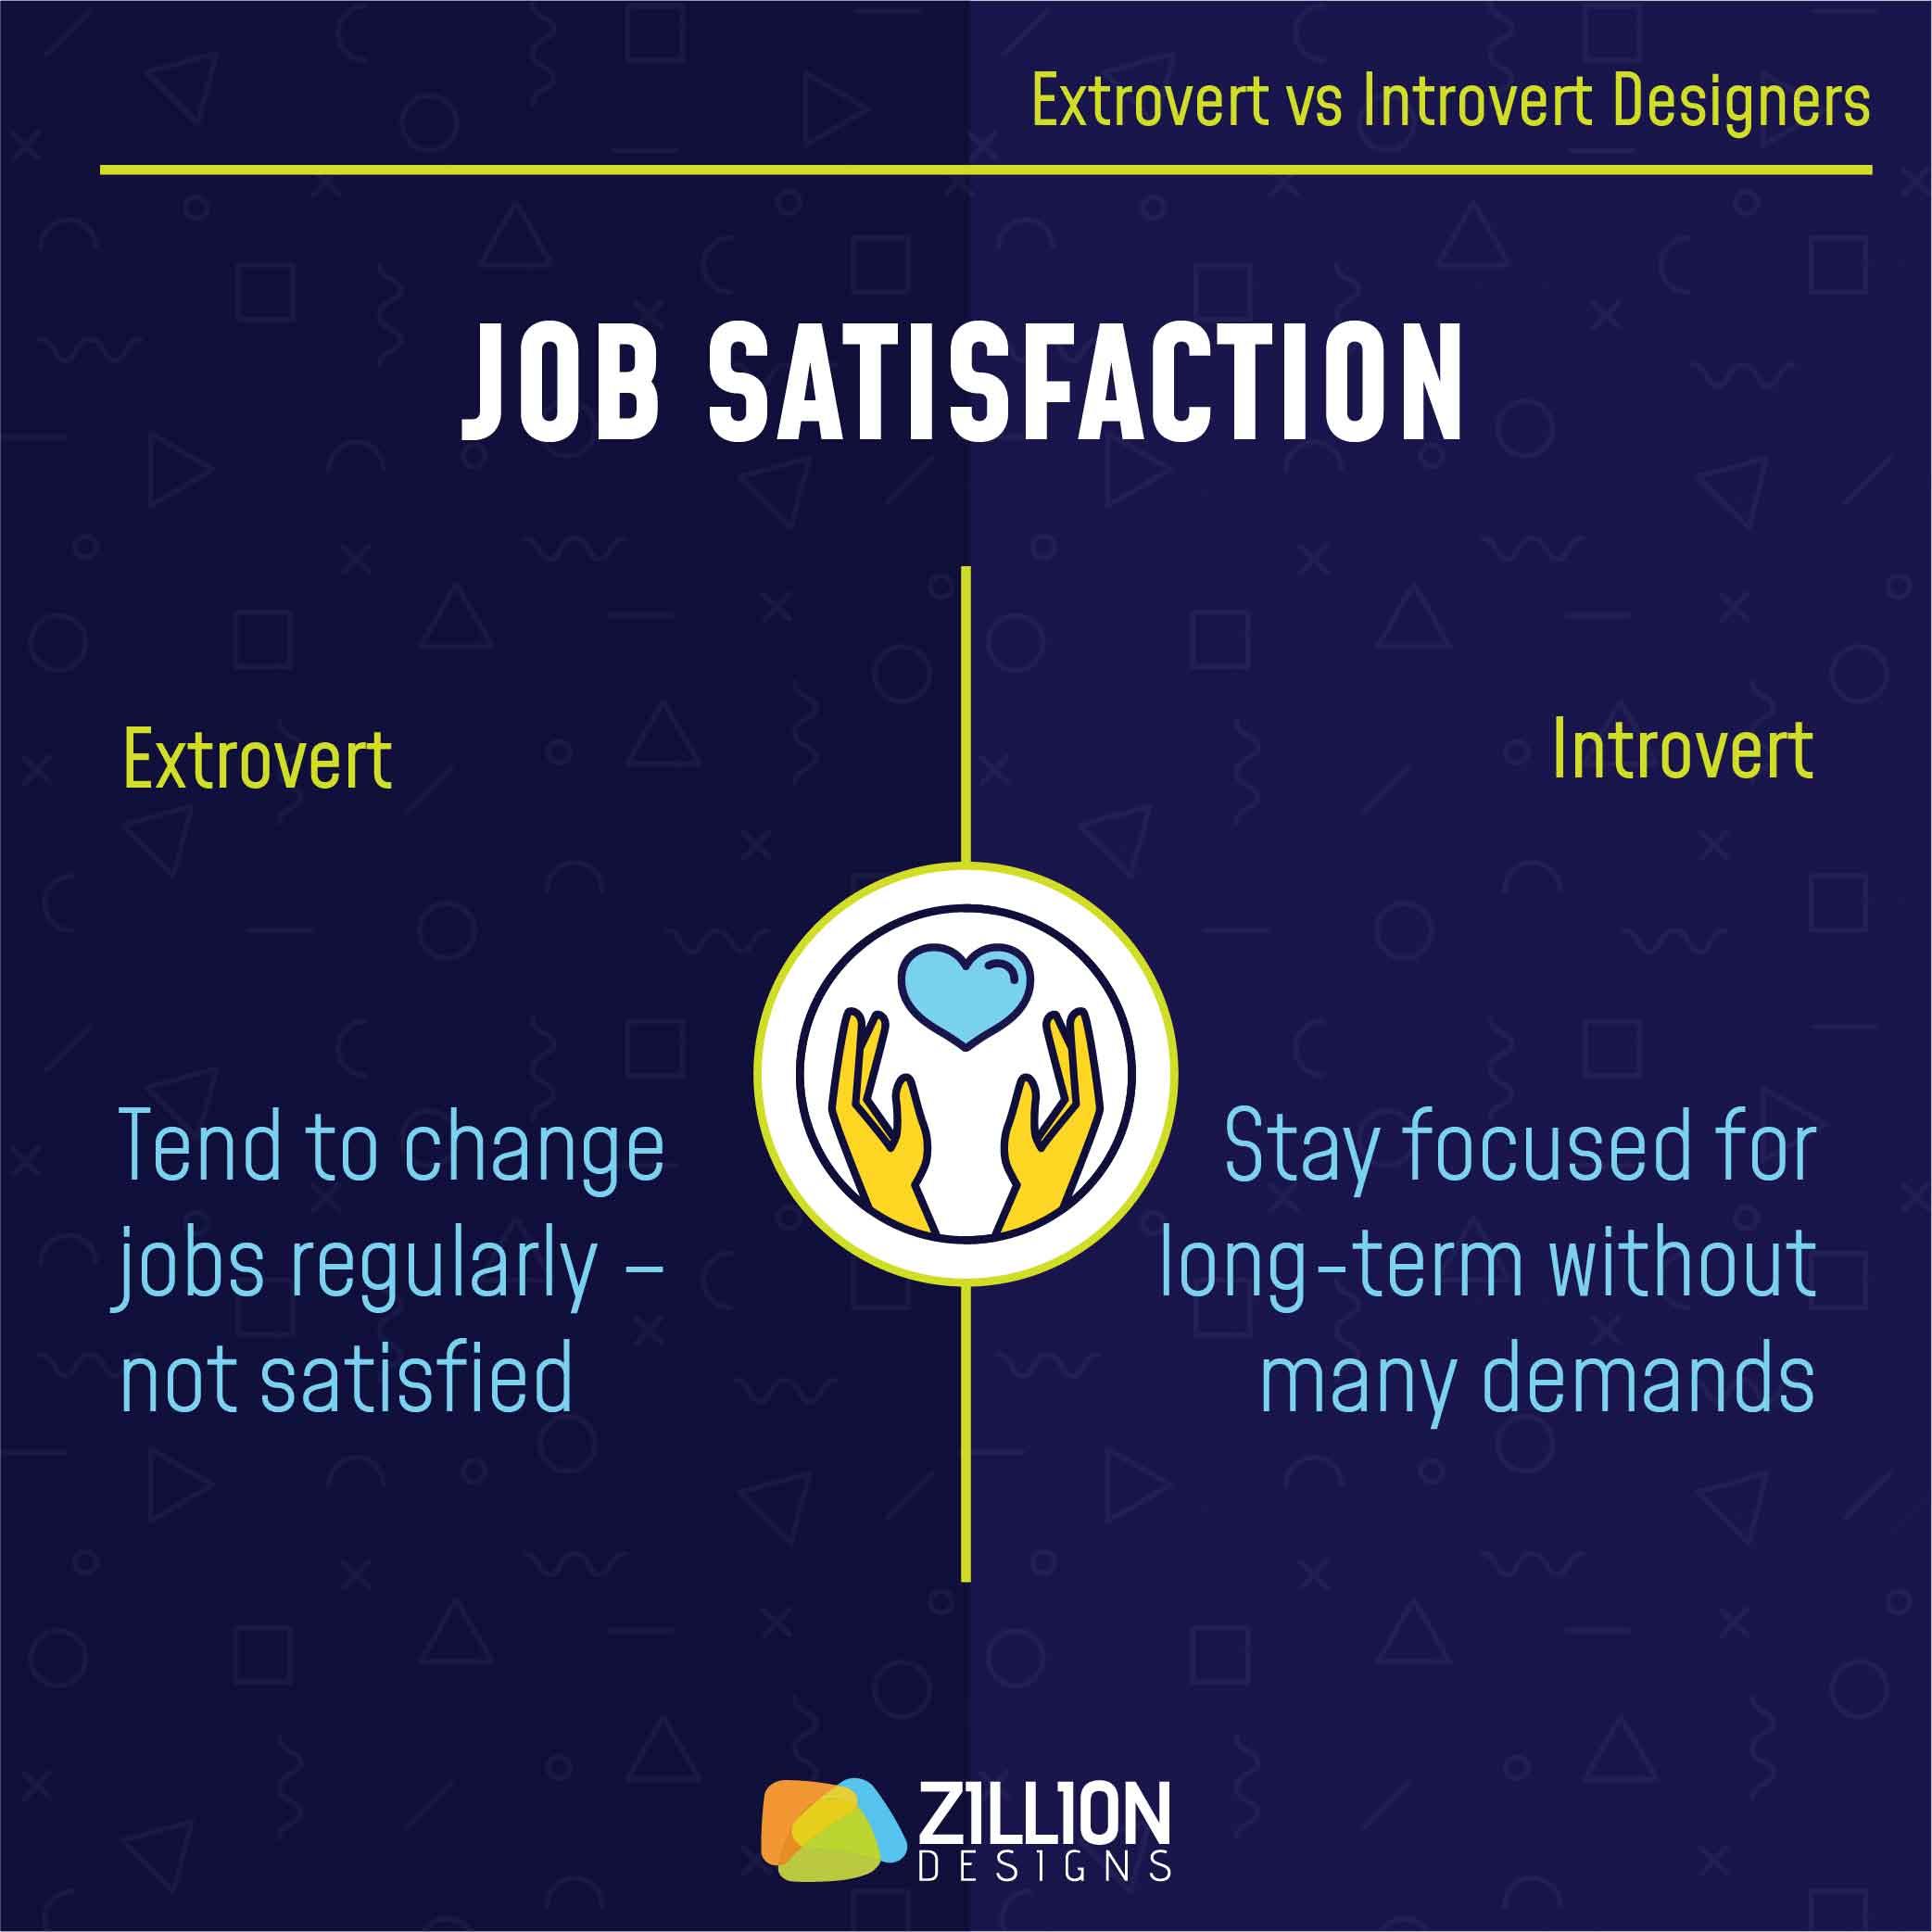 Extrovert vs Introvert Designers 10